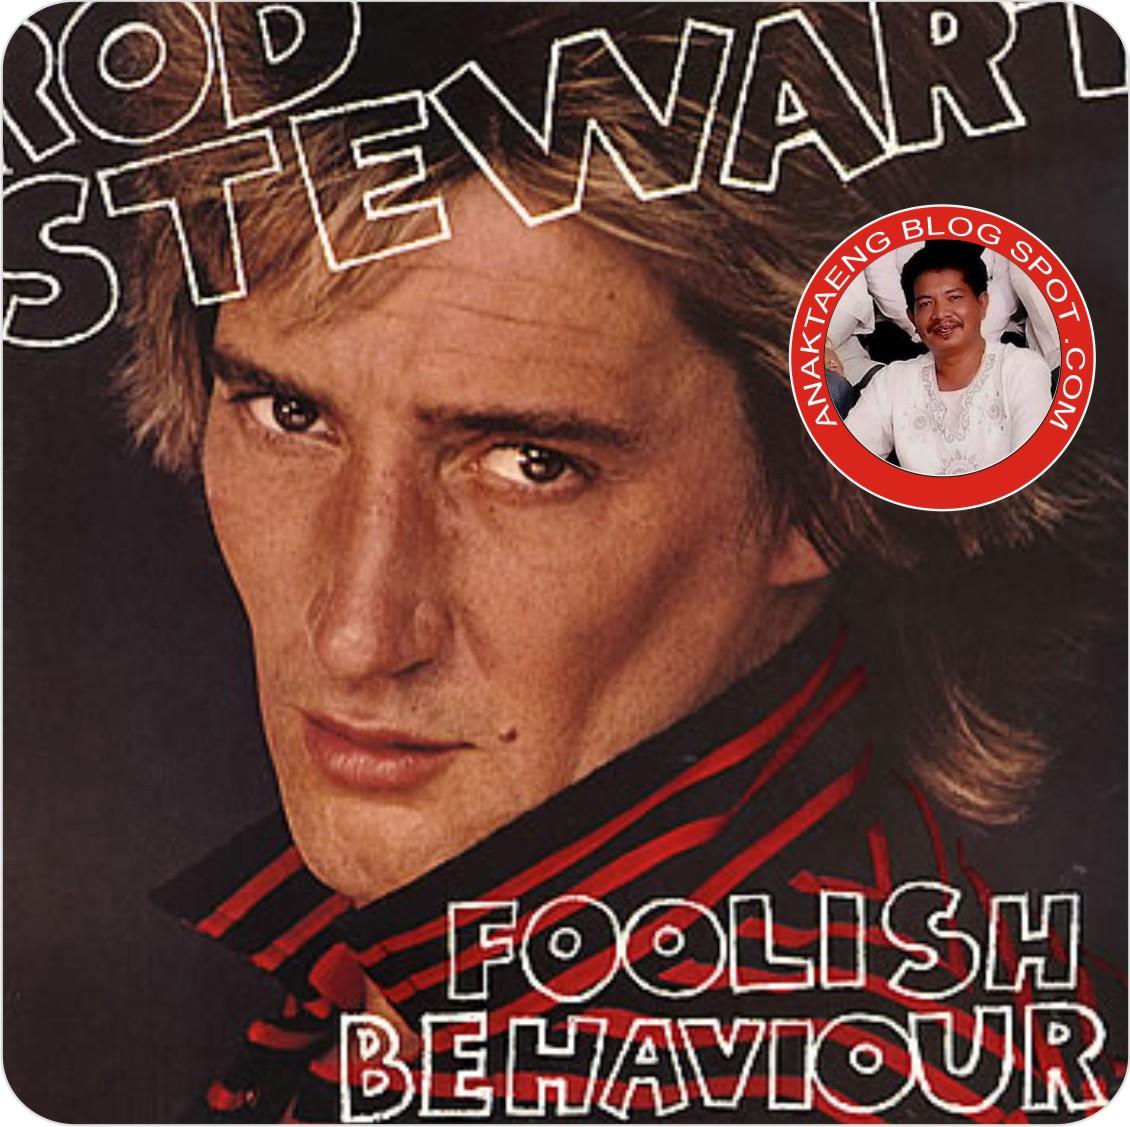 Download Lagu Oh Oh Jane Jaana: Download Lagu Untuk Dikenang (by Anak Taeng): Rod Stewart